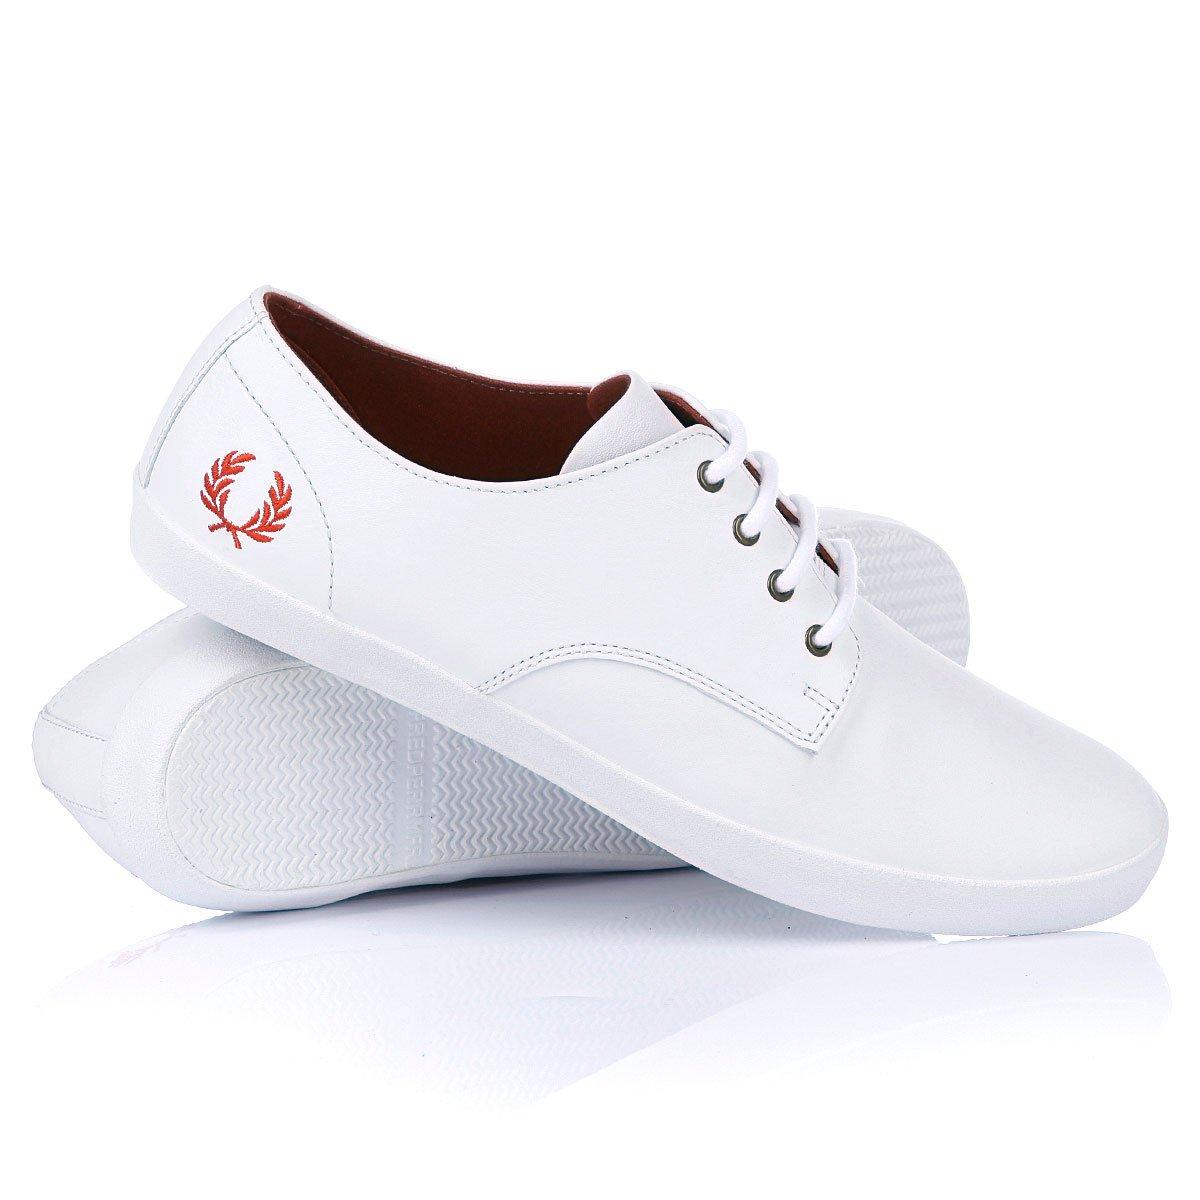 e6feb78c Купить кеды Fred Perry Foxx Leather White/White (111012shoesfred02) в  интернет-магазине Proskater.by